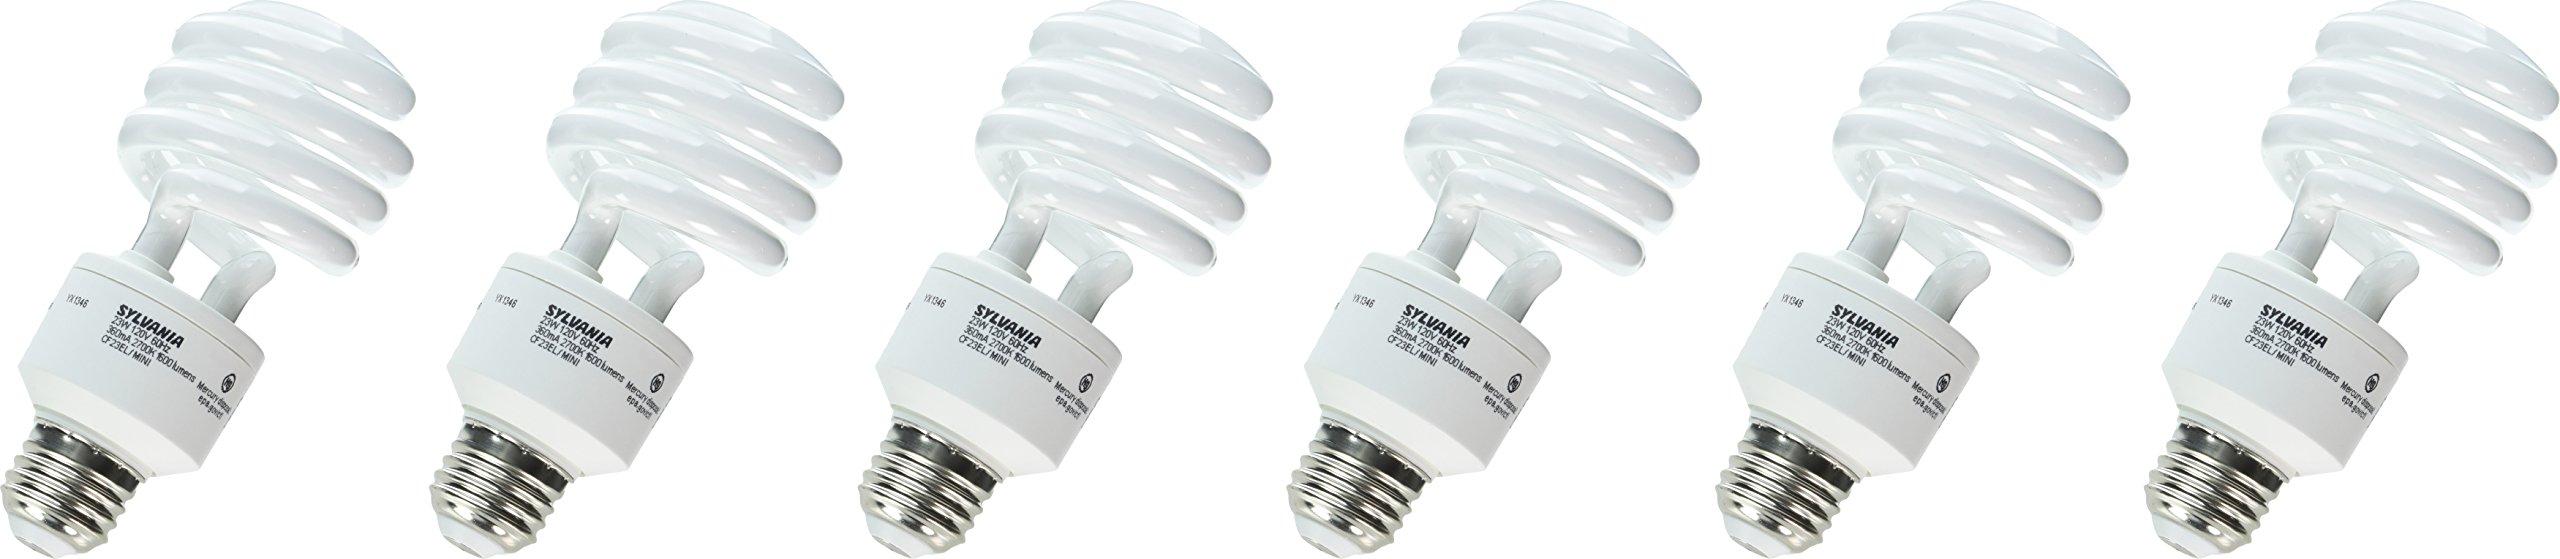 Sylvania 29490 23-Watt CFL Mini Twist Light Bulb, Soft White, 6 pack